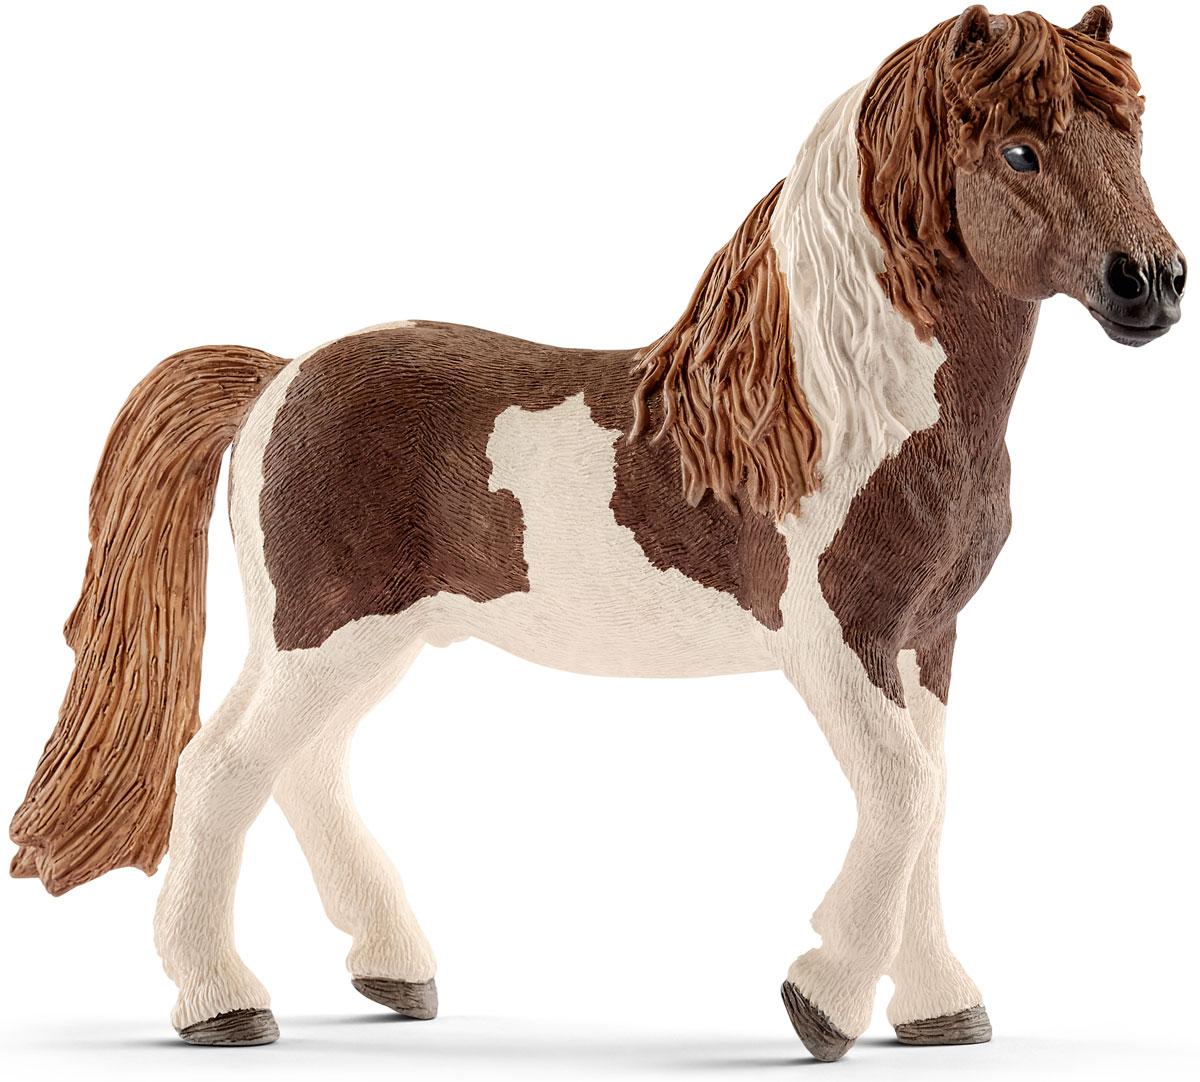 Schleich Фигурка Исландский пони жеребец schleich исландский пони кобыла